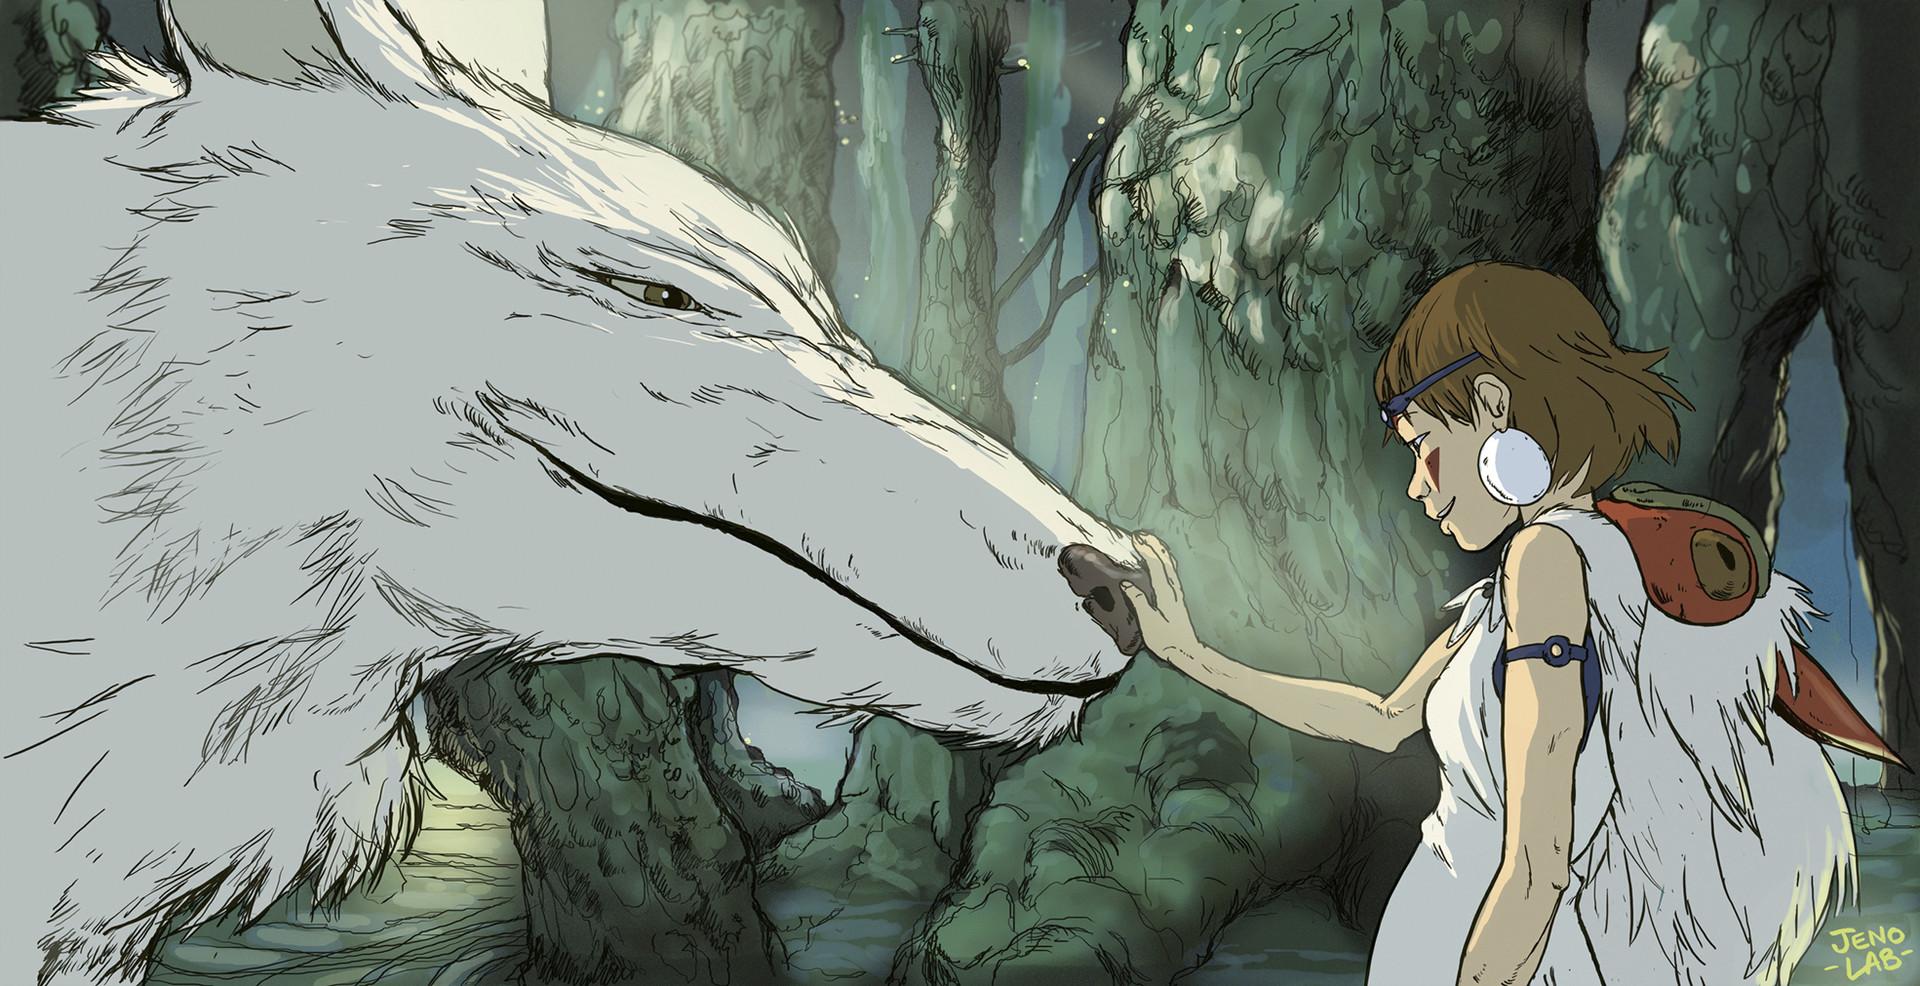 Ini Bukan Perang Antara Manusia Tapi Peradaban Dan Alam Mononoke Hime Adalah Anime Yang Menggambarkan Hubungan Teknologi